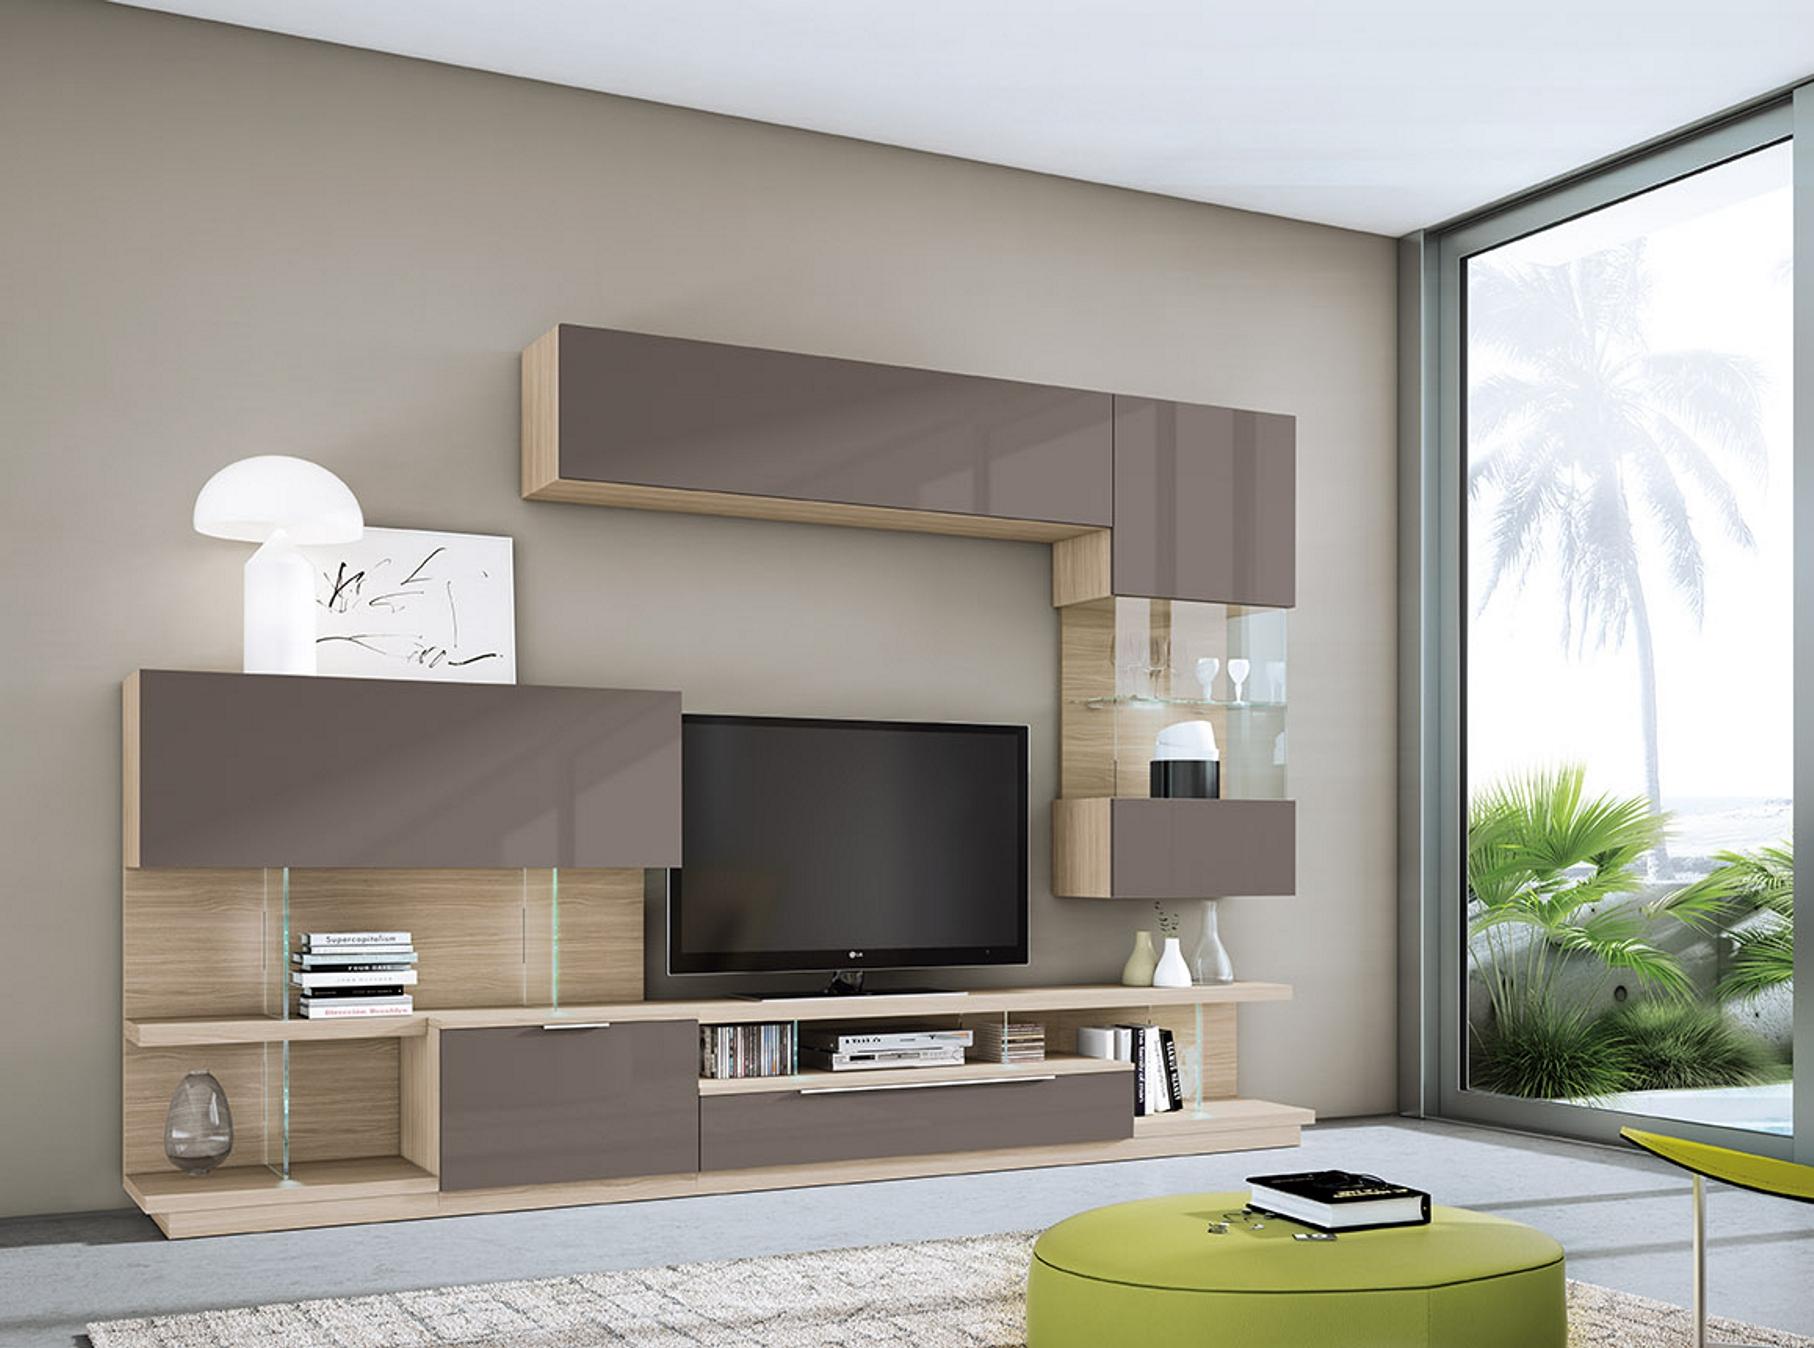 salon-moderno-Zion-3.0-muebles-paco-caballero-0907-5c8d32dfba1e6